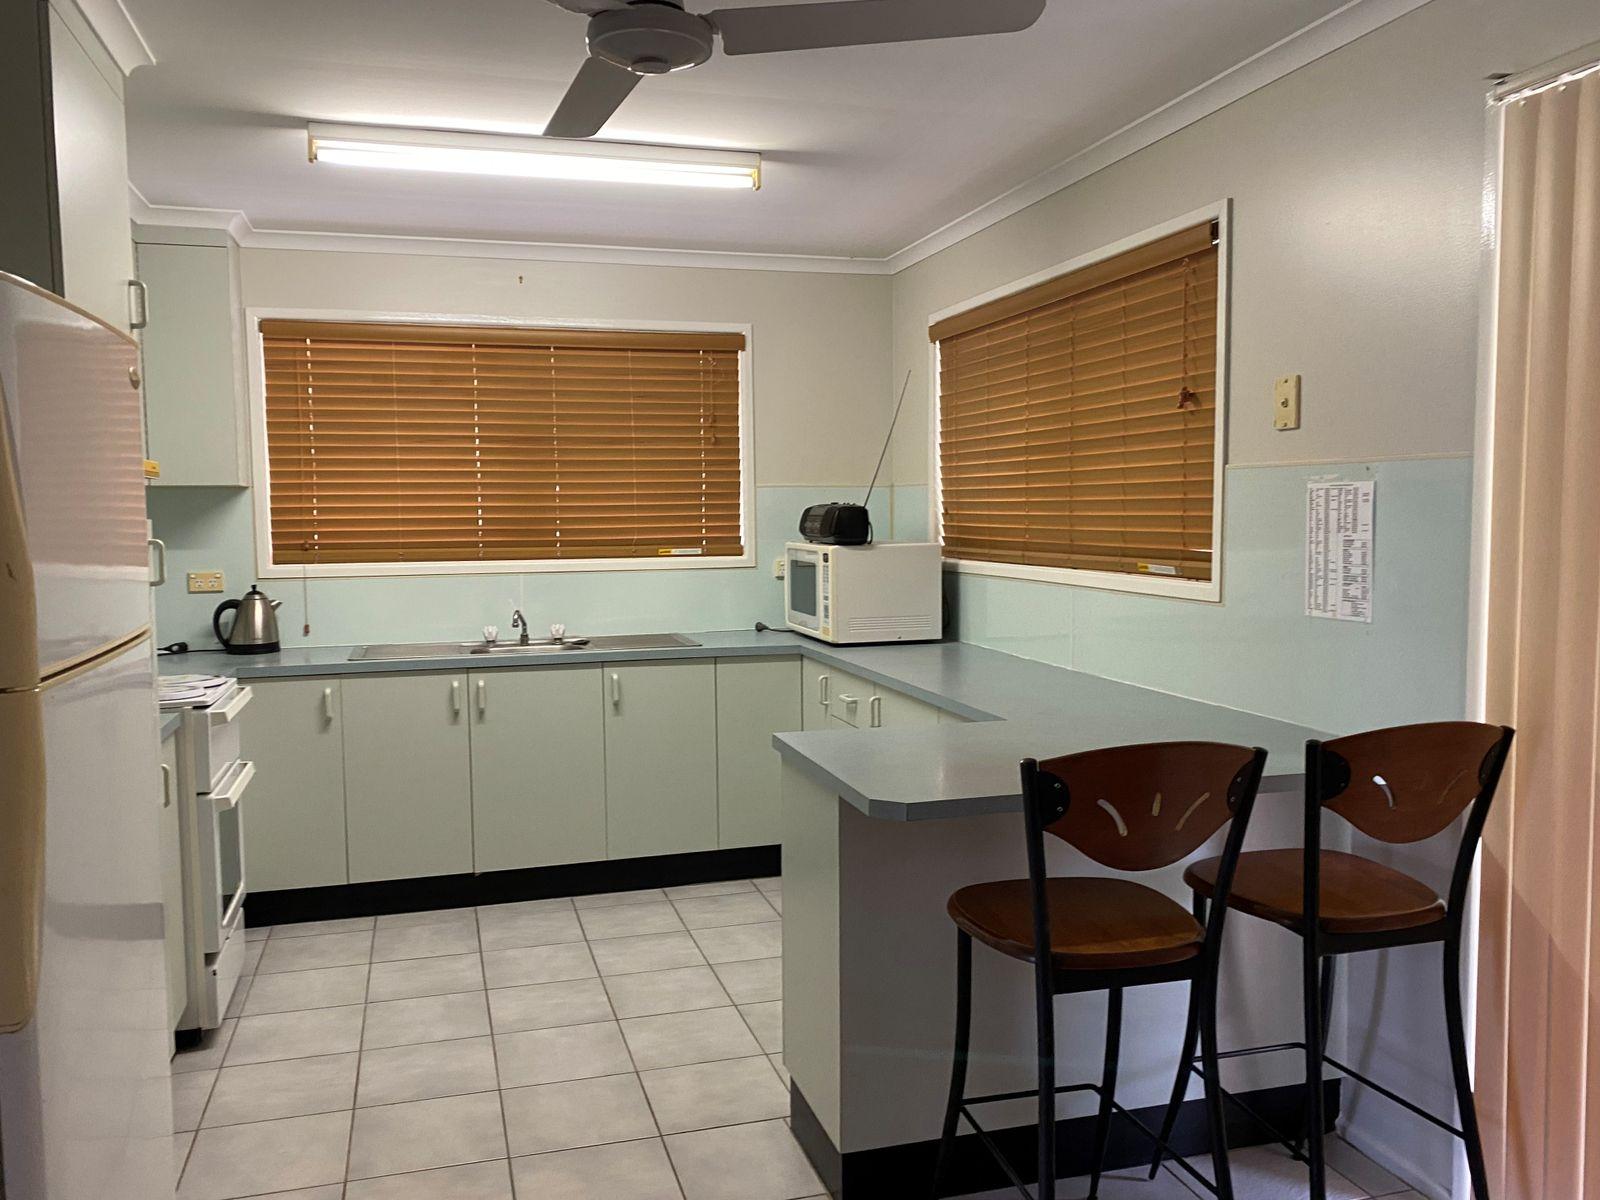 471 East Funnel Creek Road, Sarina Range, QLD 4737